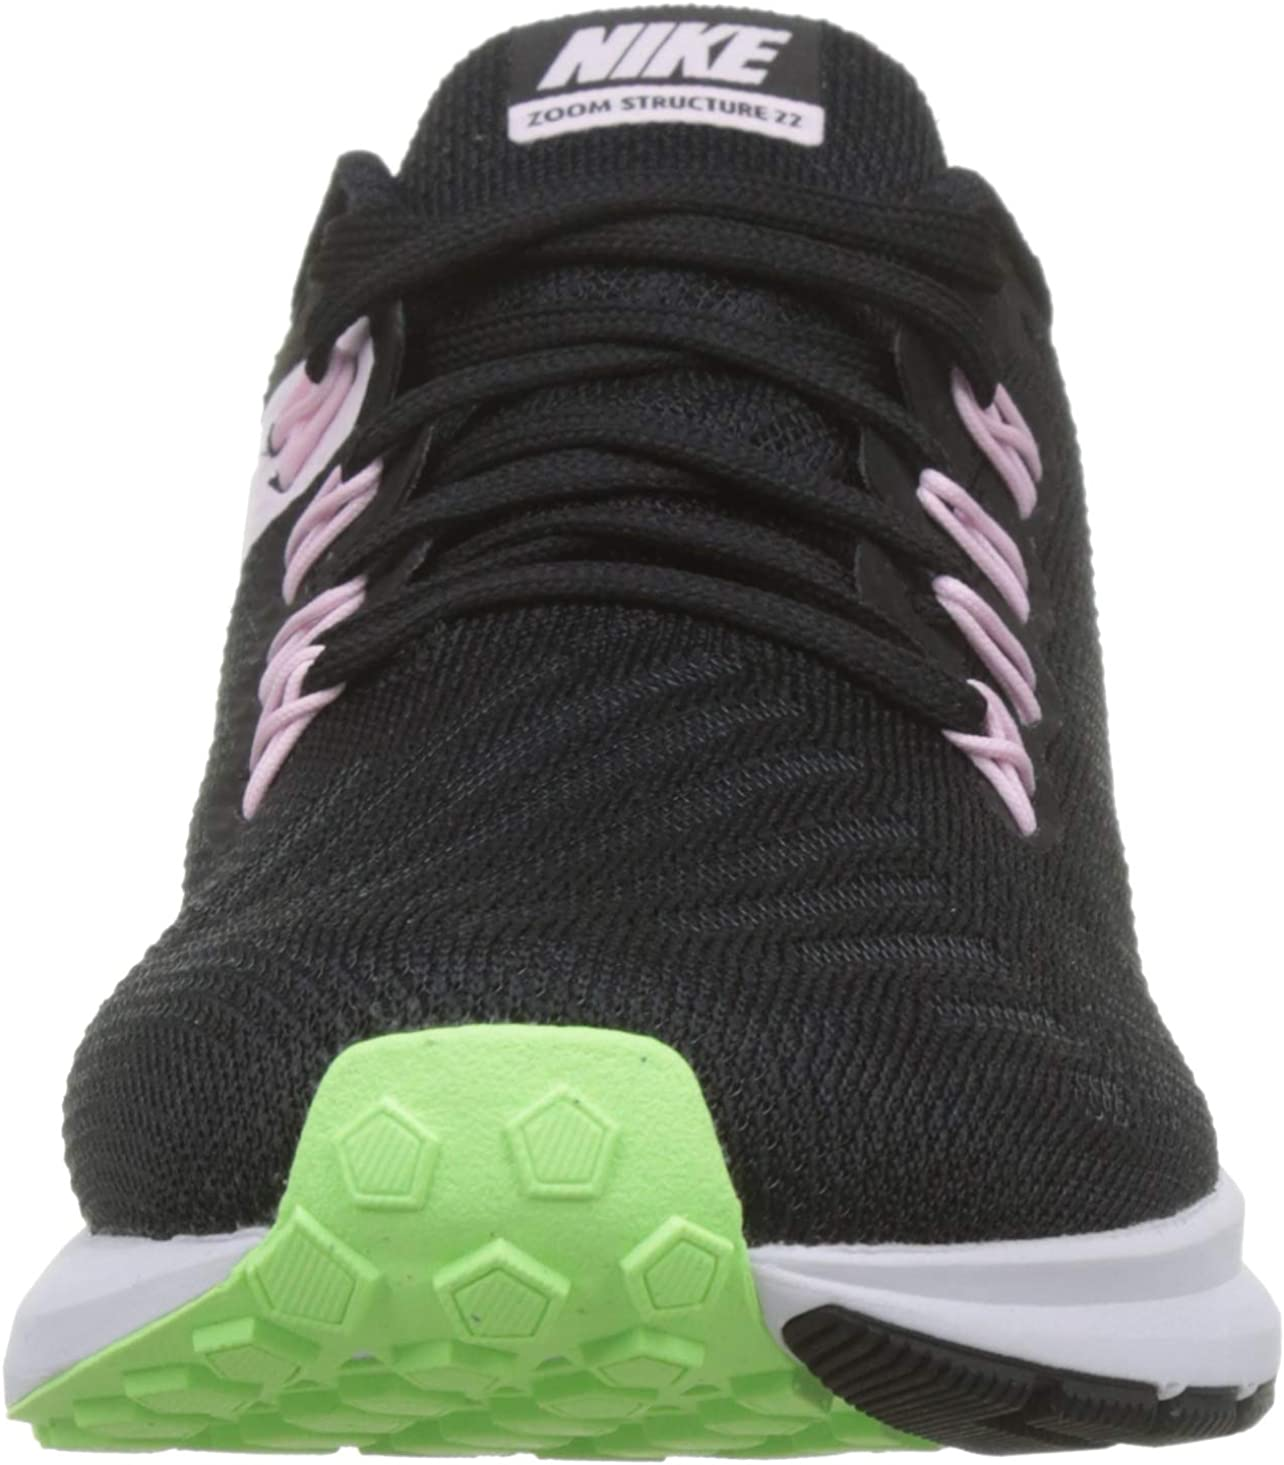 Chaussures dAthlétisme Femme Nike W Air Zoom Structure 22 Femme ...